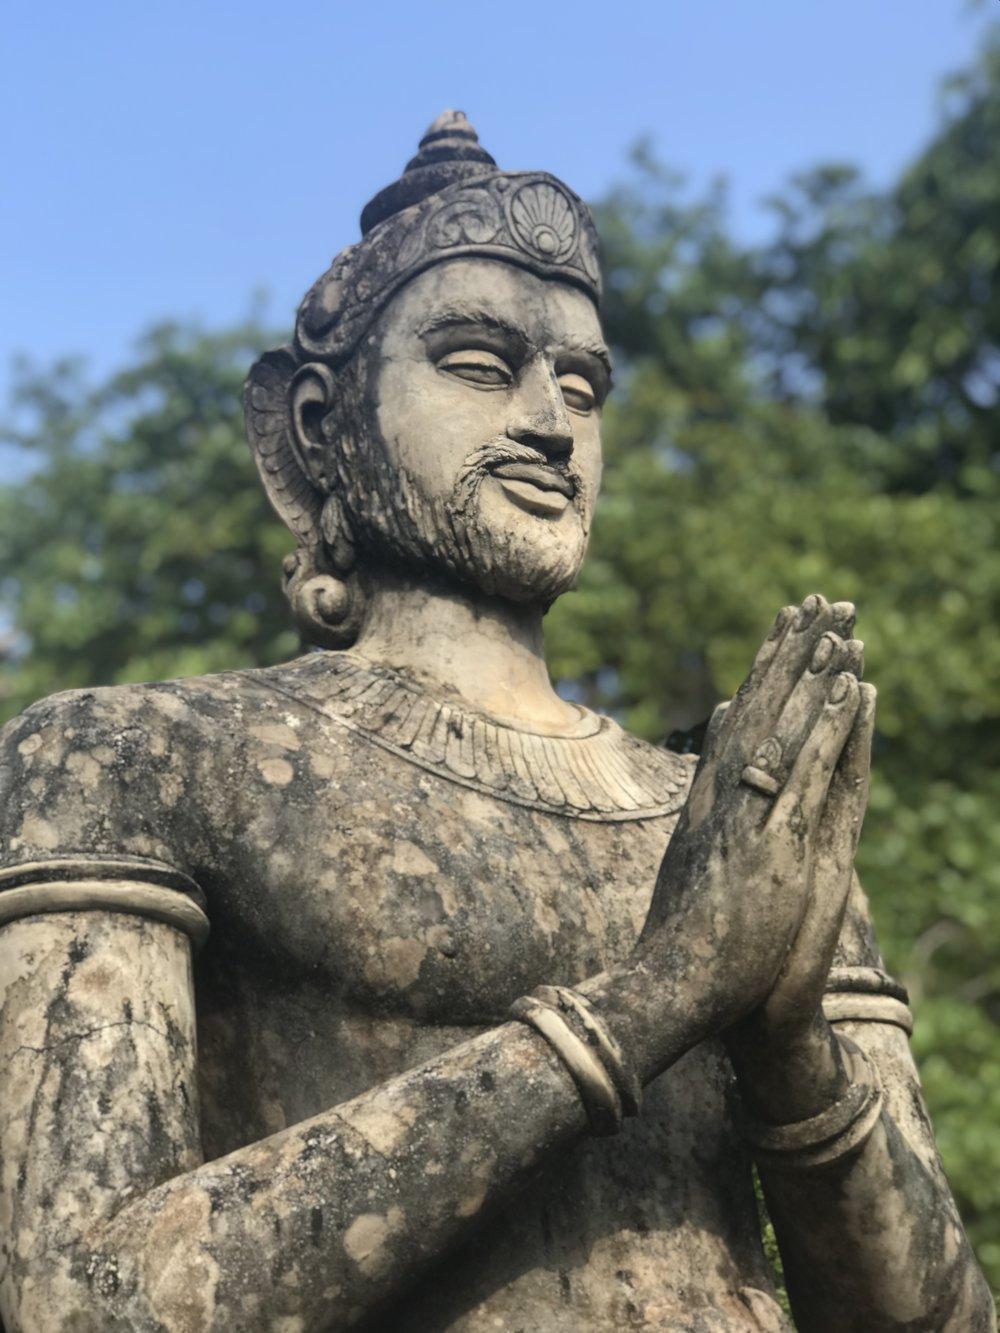 A statue of King Makalantissa outside the Ambasthala Dagaba. Taken with the iPhone's 'portrait mode.'